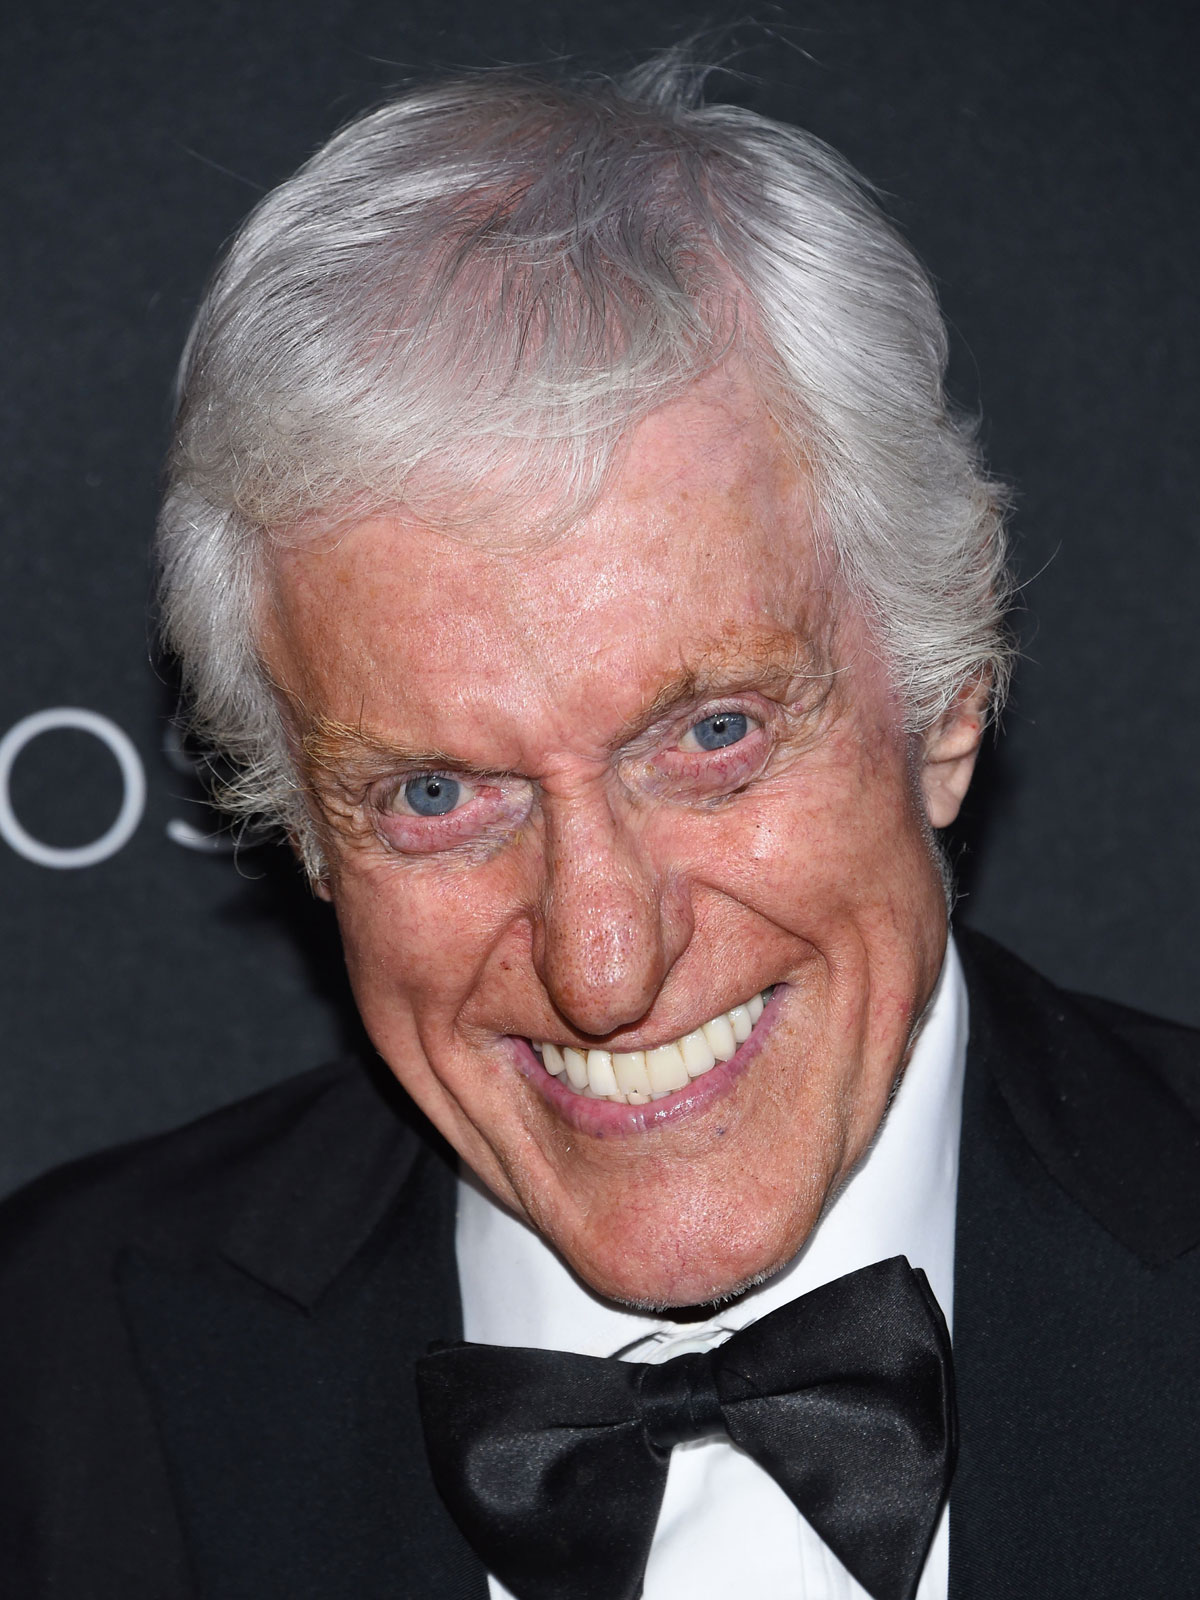 Dick van dyke actor